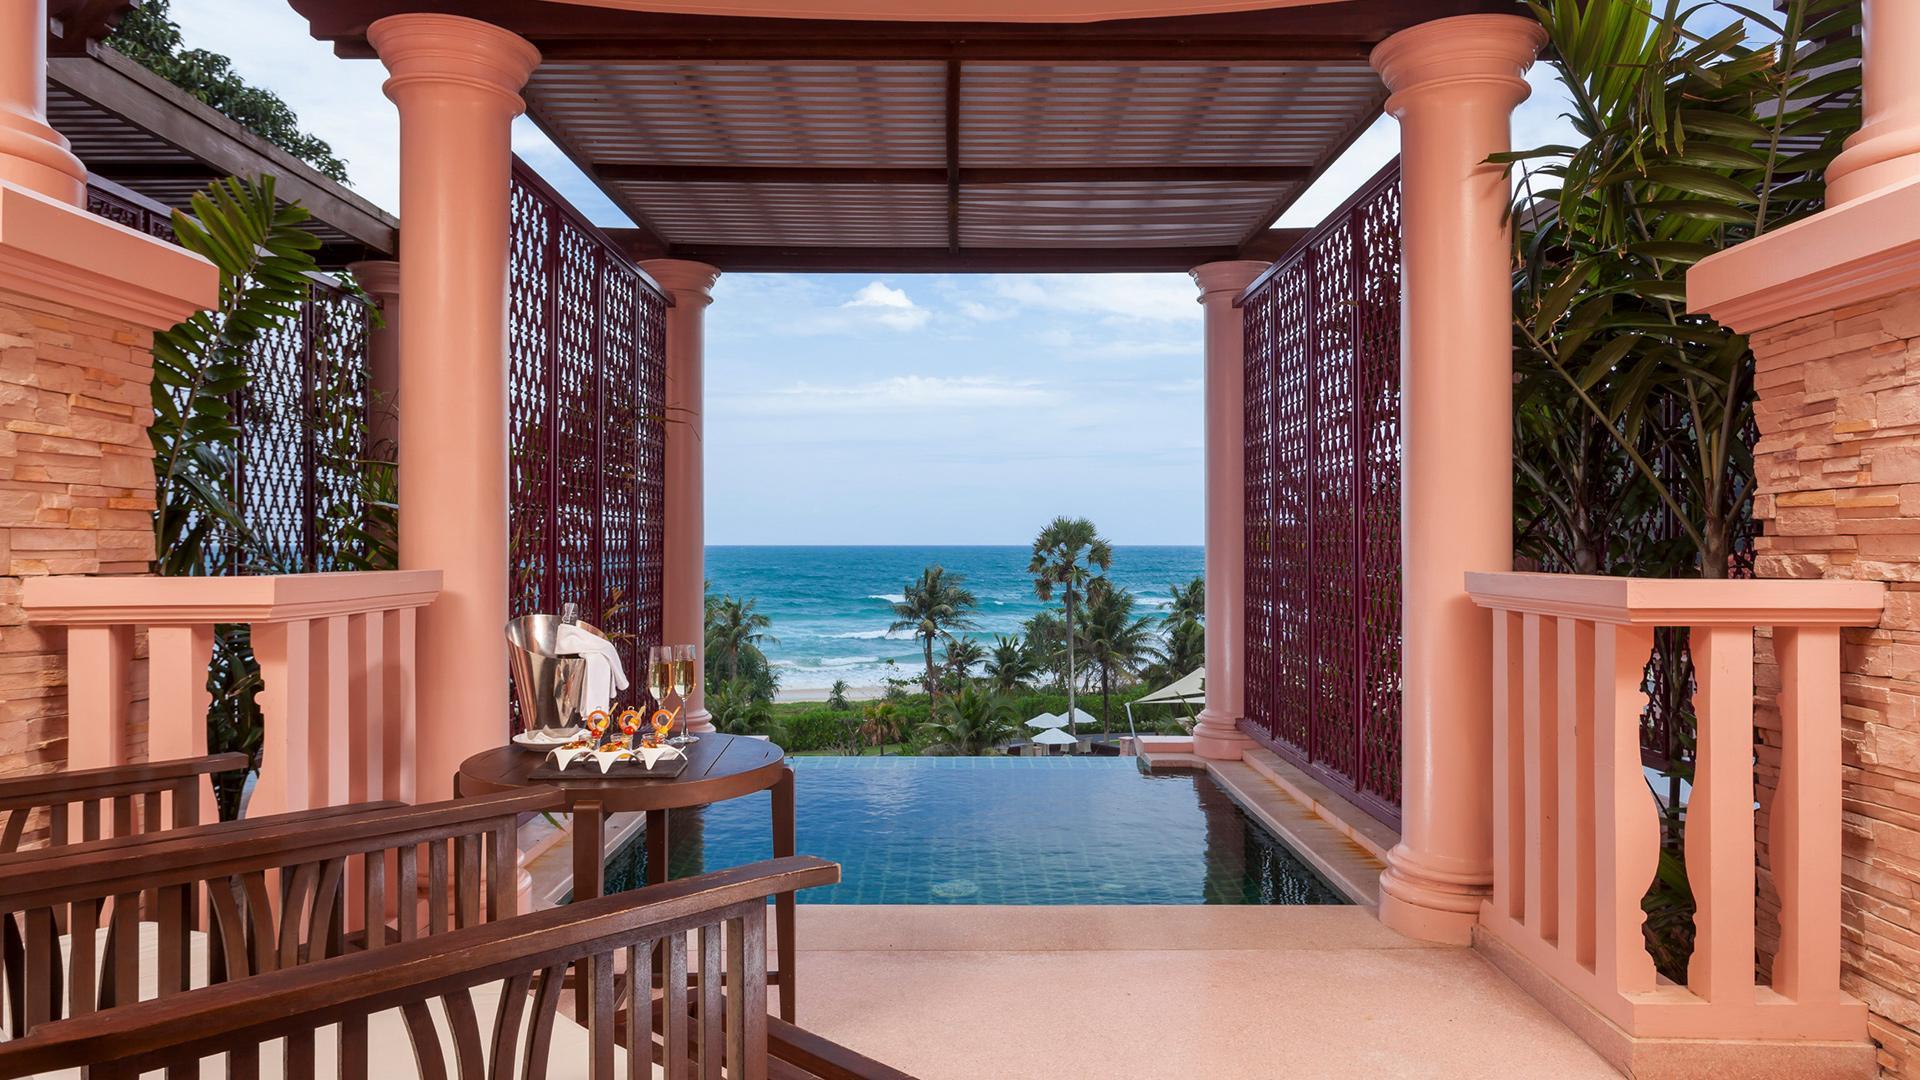 Deluxe Pool Suite image 1 at Centara Grand Beach Resort Phuket by อำเภอเมืองภูเก็ต, Phuket, Thailand